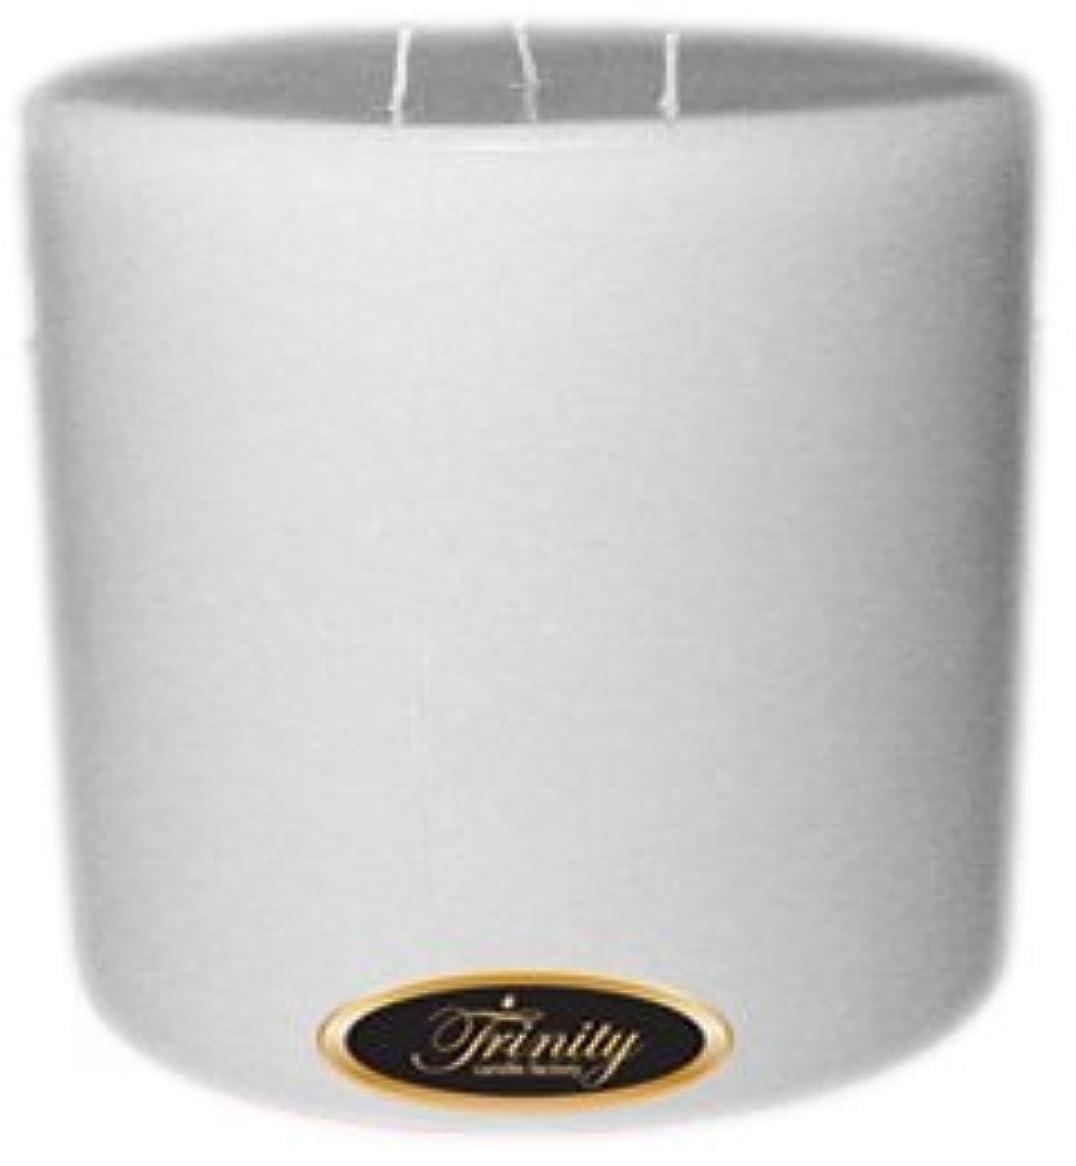 Trinity Candle工場 – Magnolia – Pillar Candle – 6 x 6